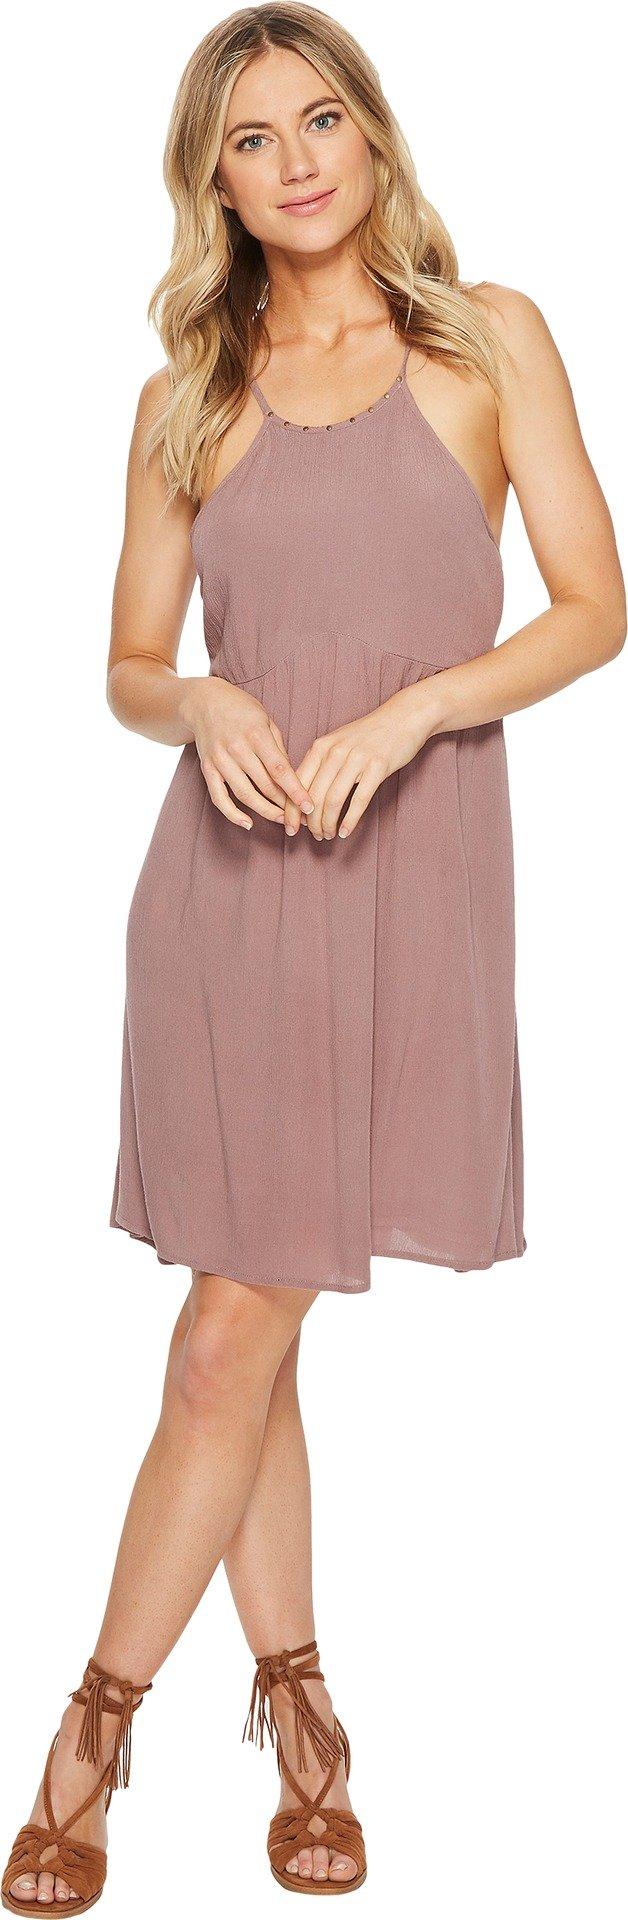 Volcom Junior's What A Stud High Neck Dress, Purple Haze, S